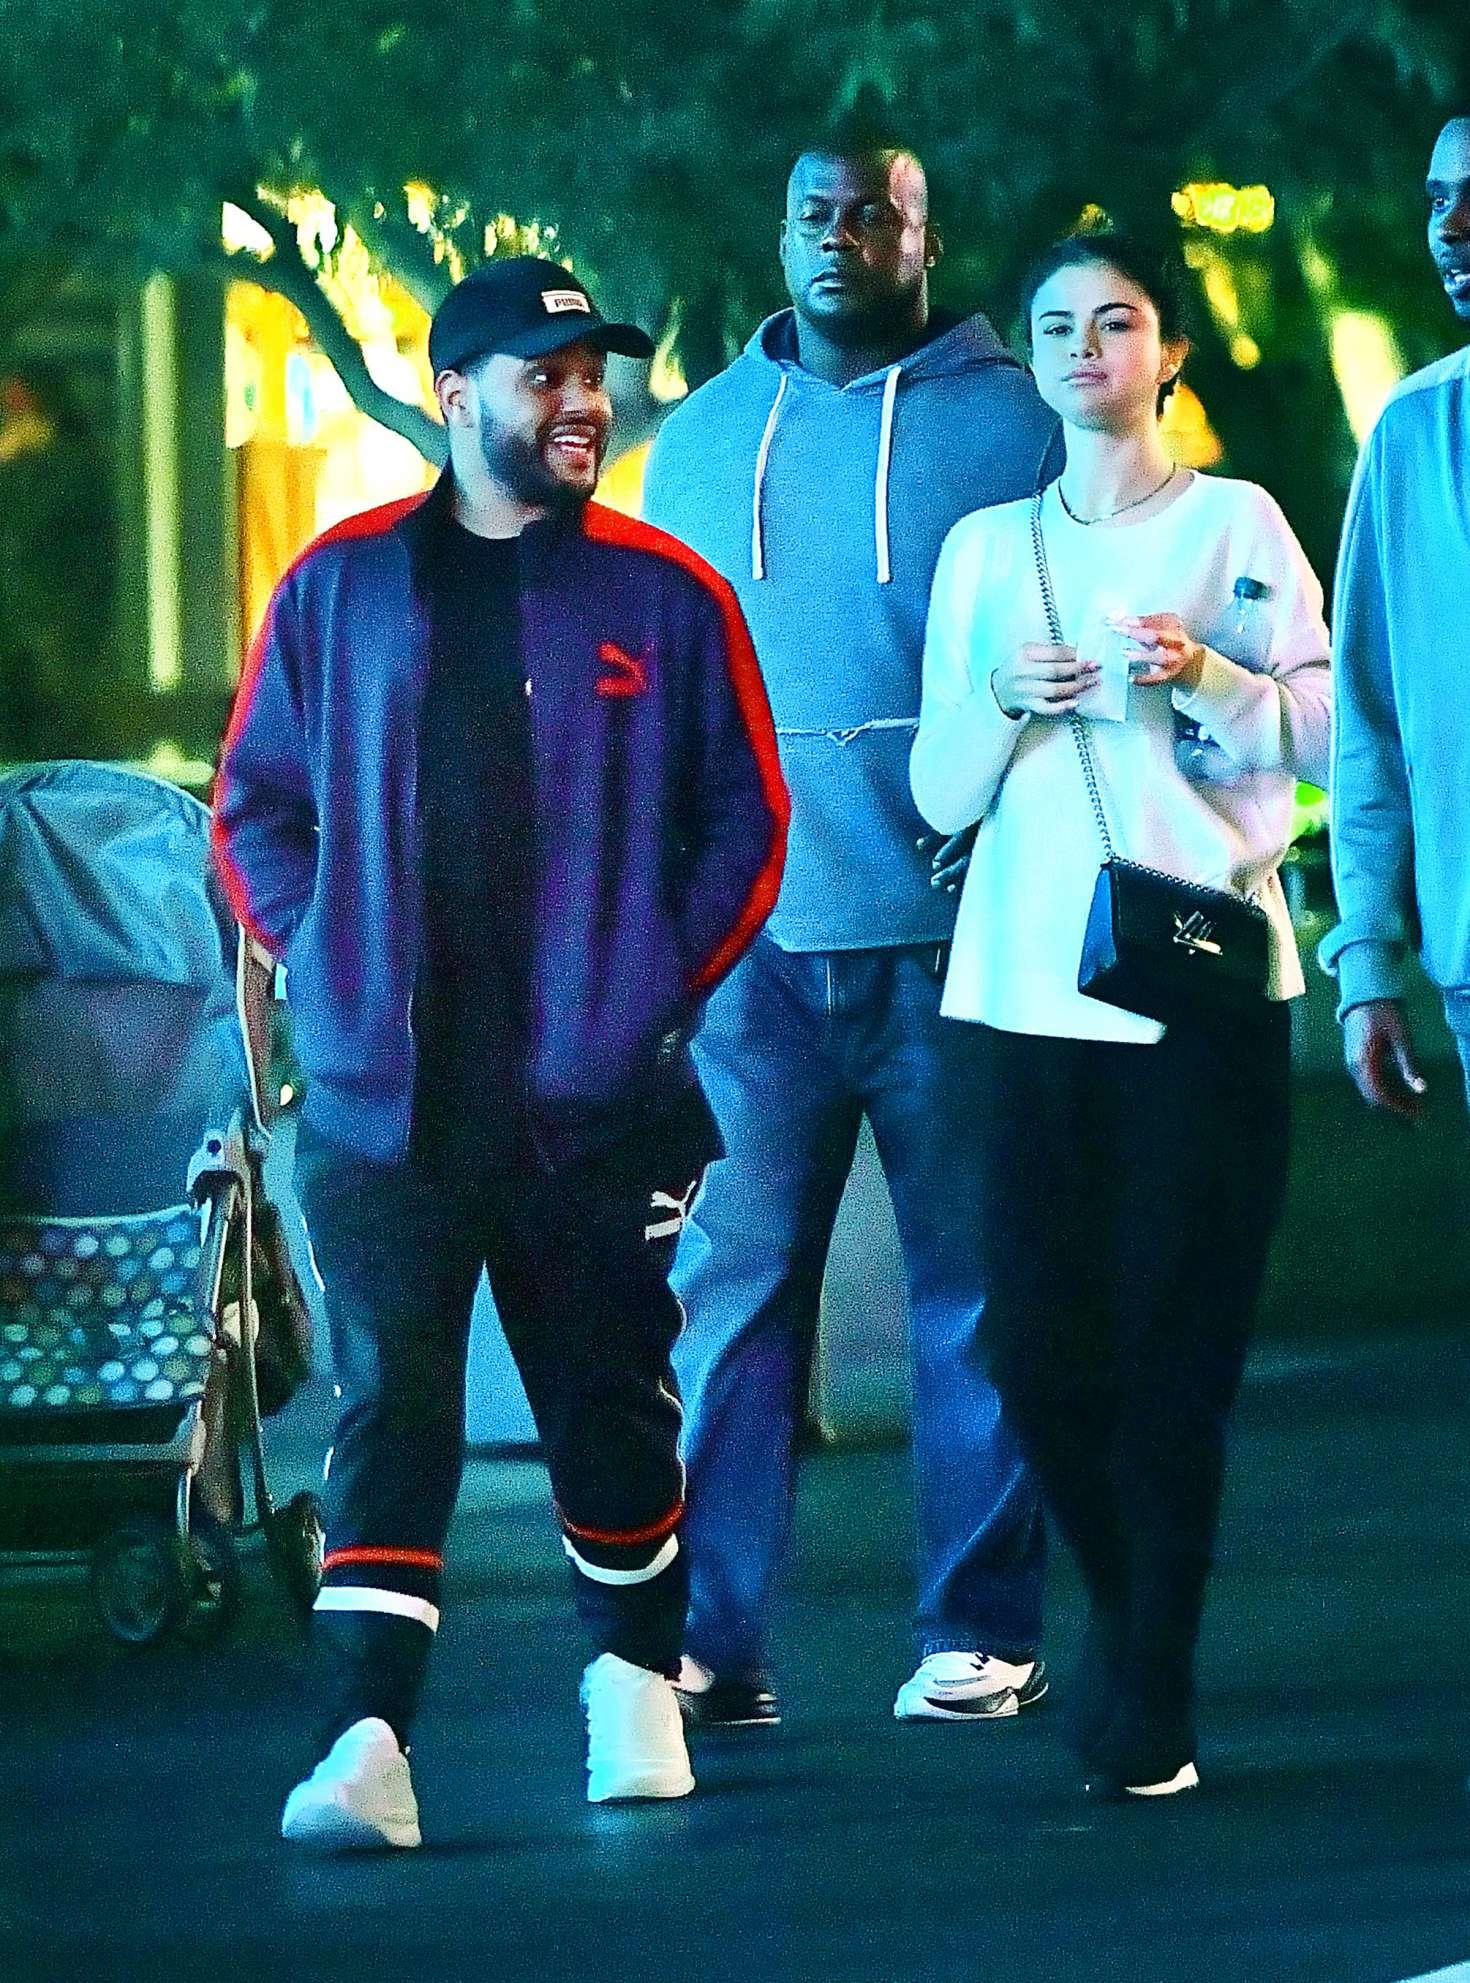 Selena Gomez 2017 : Selena Gomez and The Weeknd at Disneyland -28